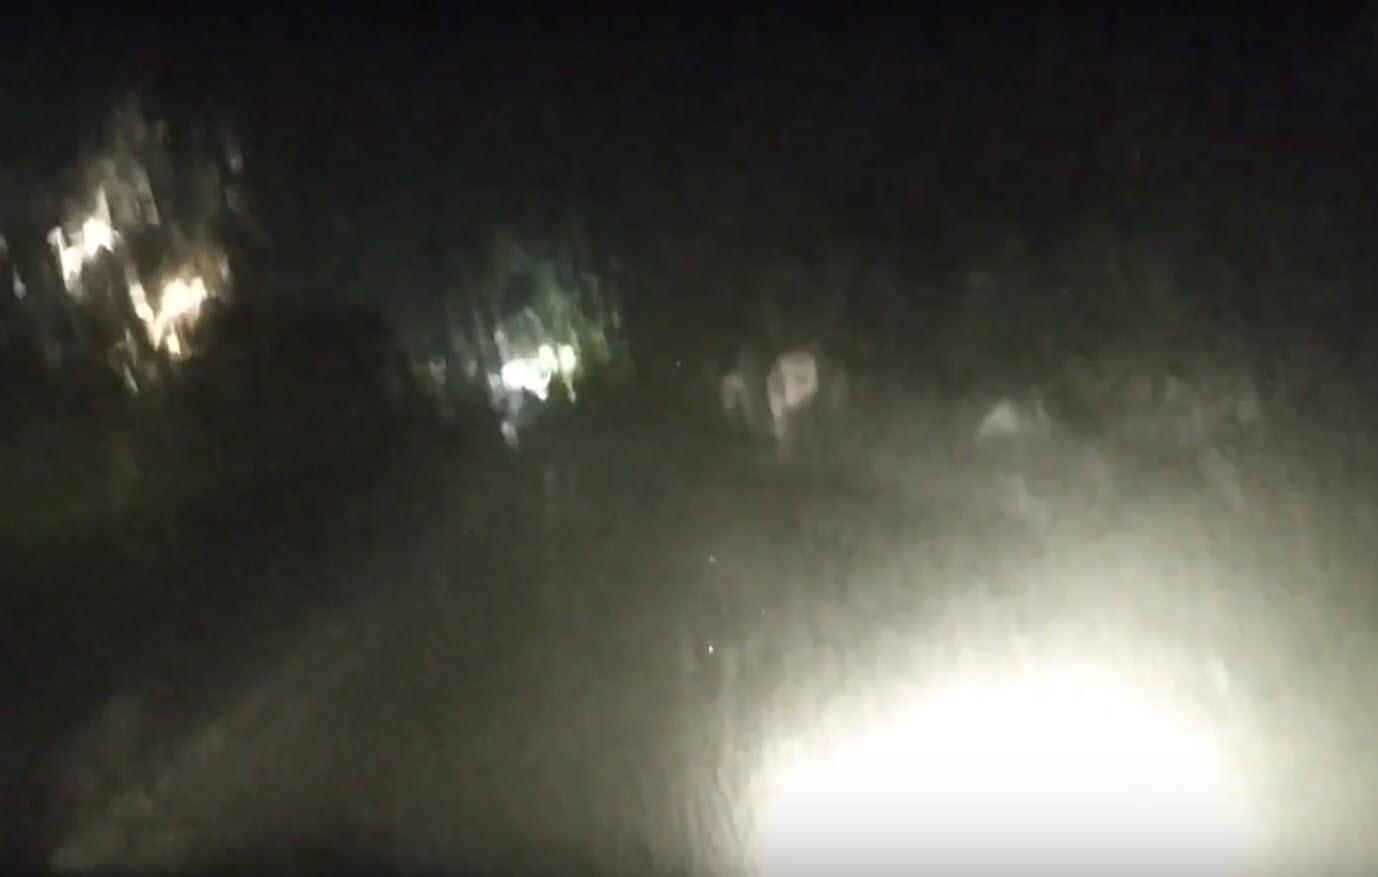 (video)Επέλαση της Ωκεανίς. Ισχυρή καταιγίδα σάρωσε τη Μύκονο